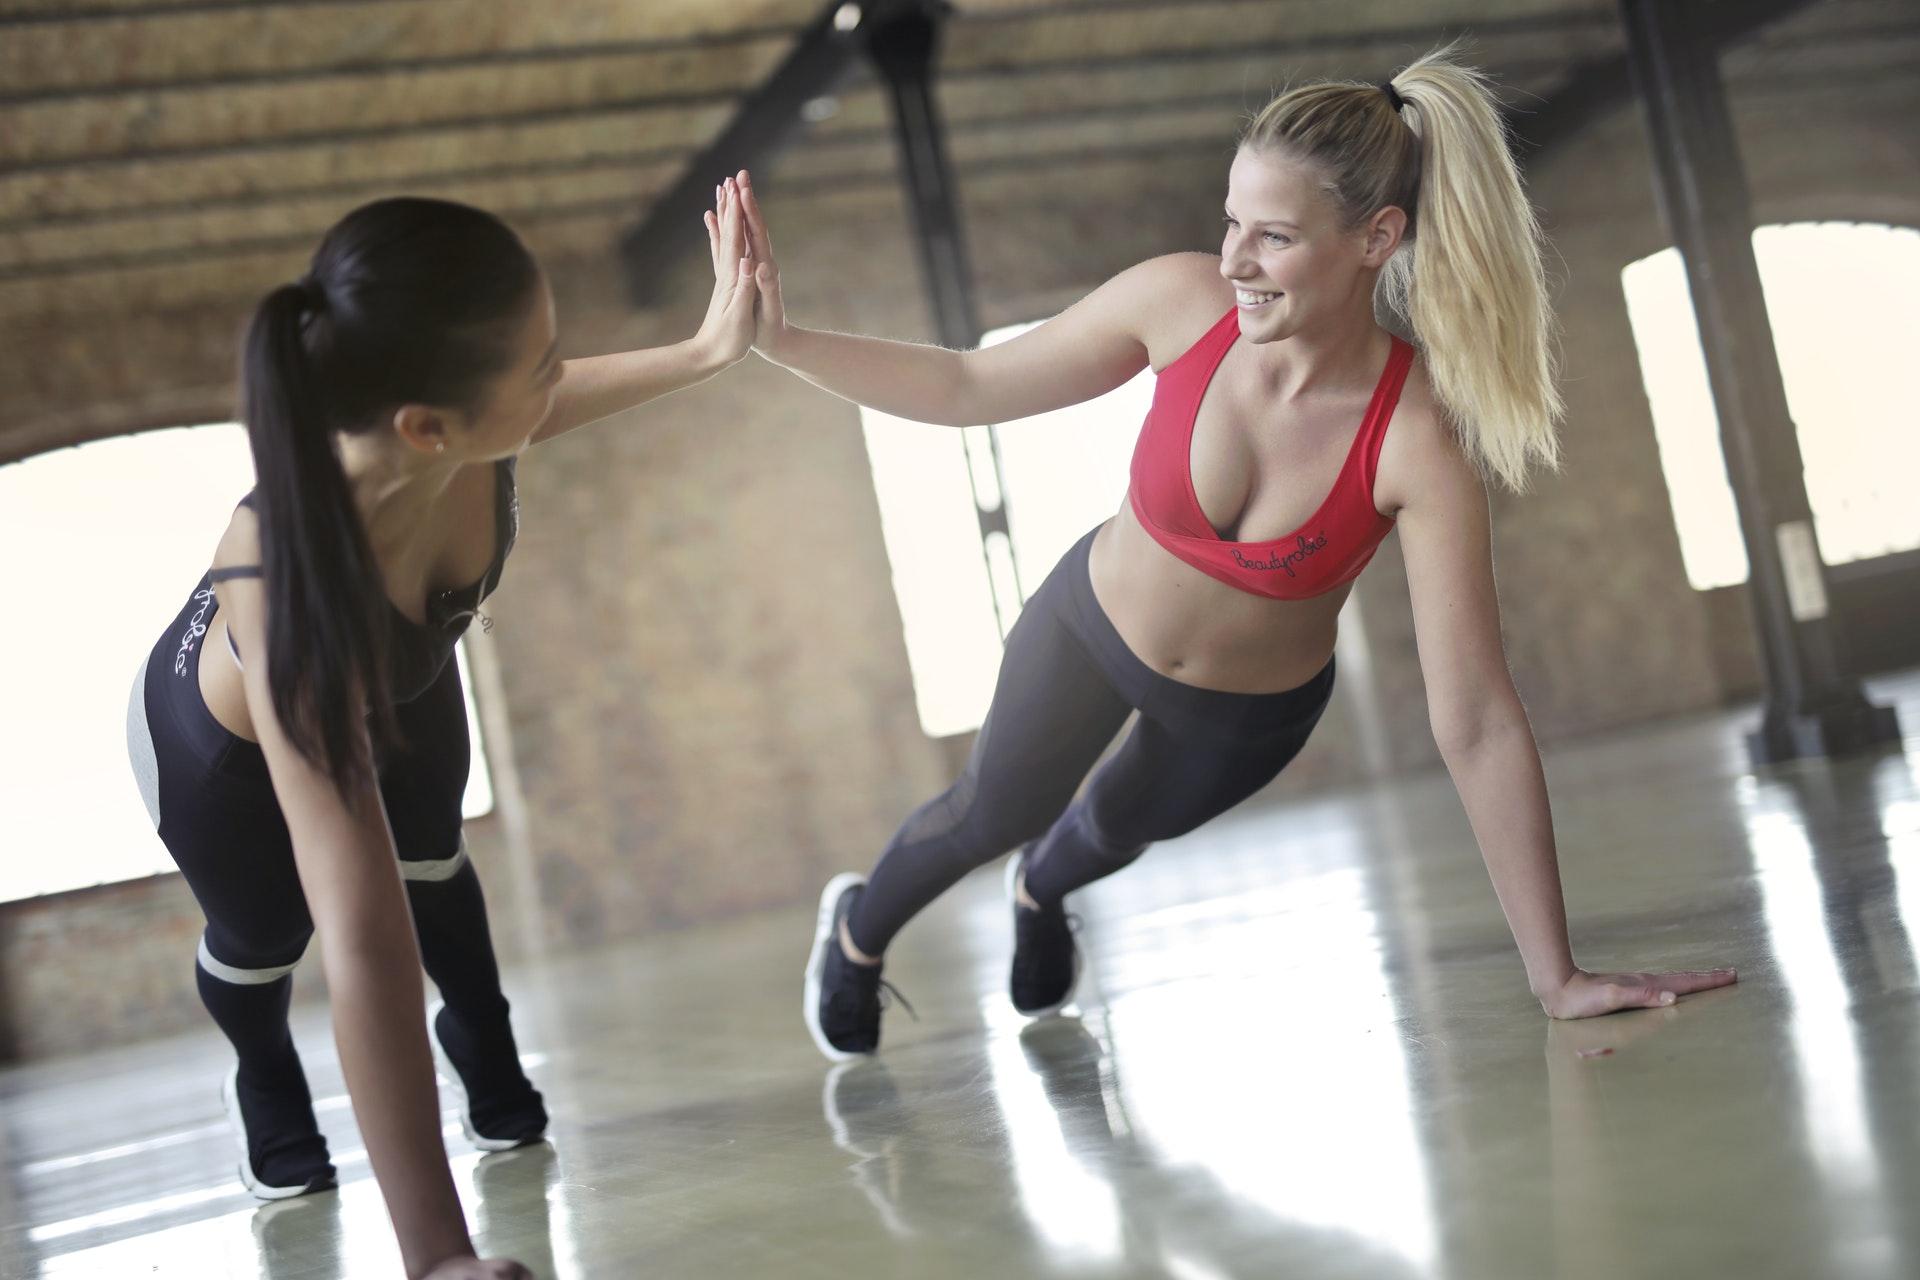 Fitness inspiration tips